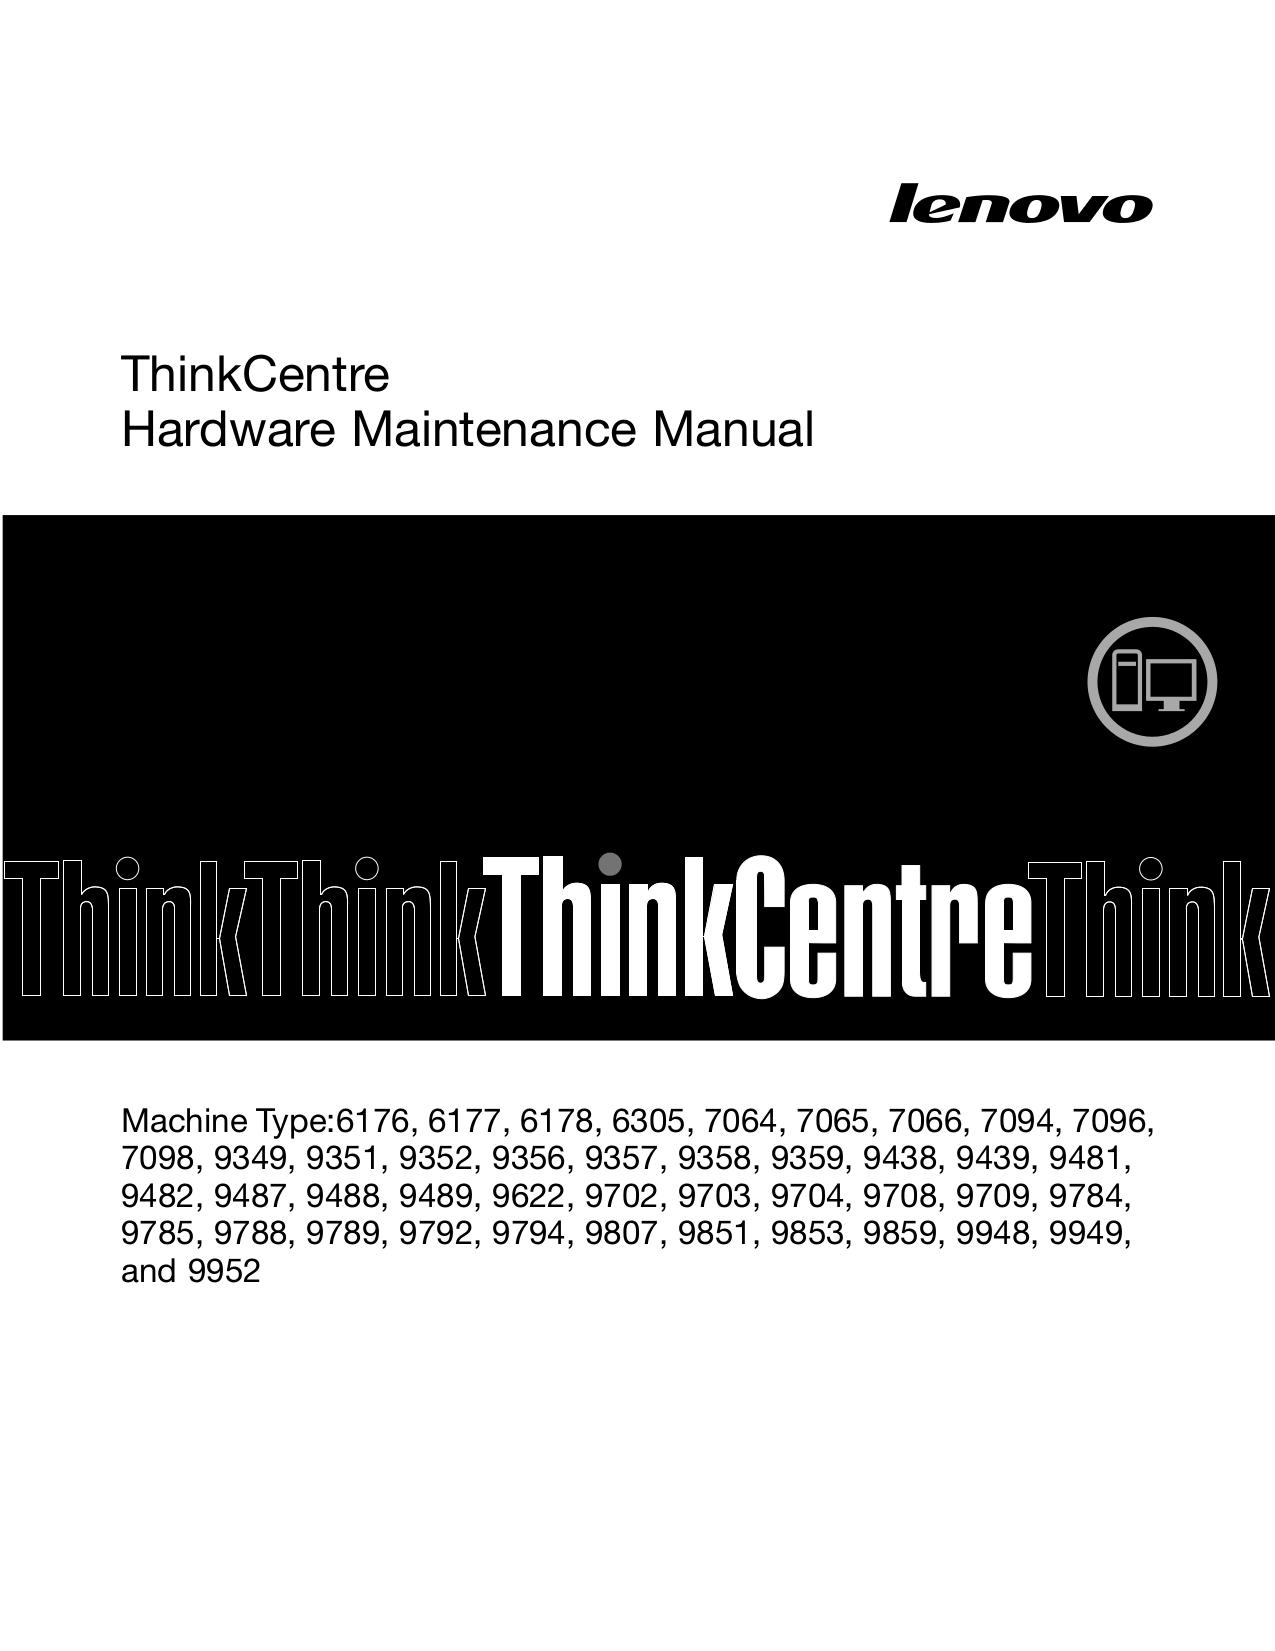 pdf for Lenovo Desktop ThinkCentre M57e 9489 manual